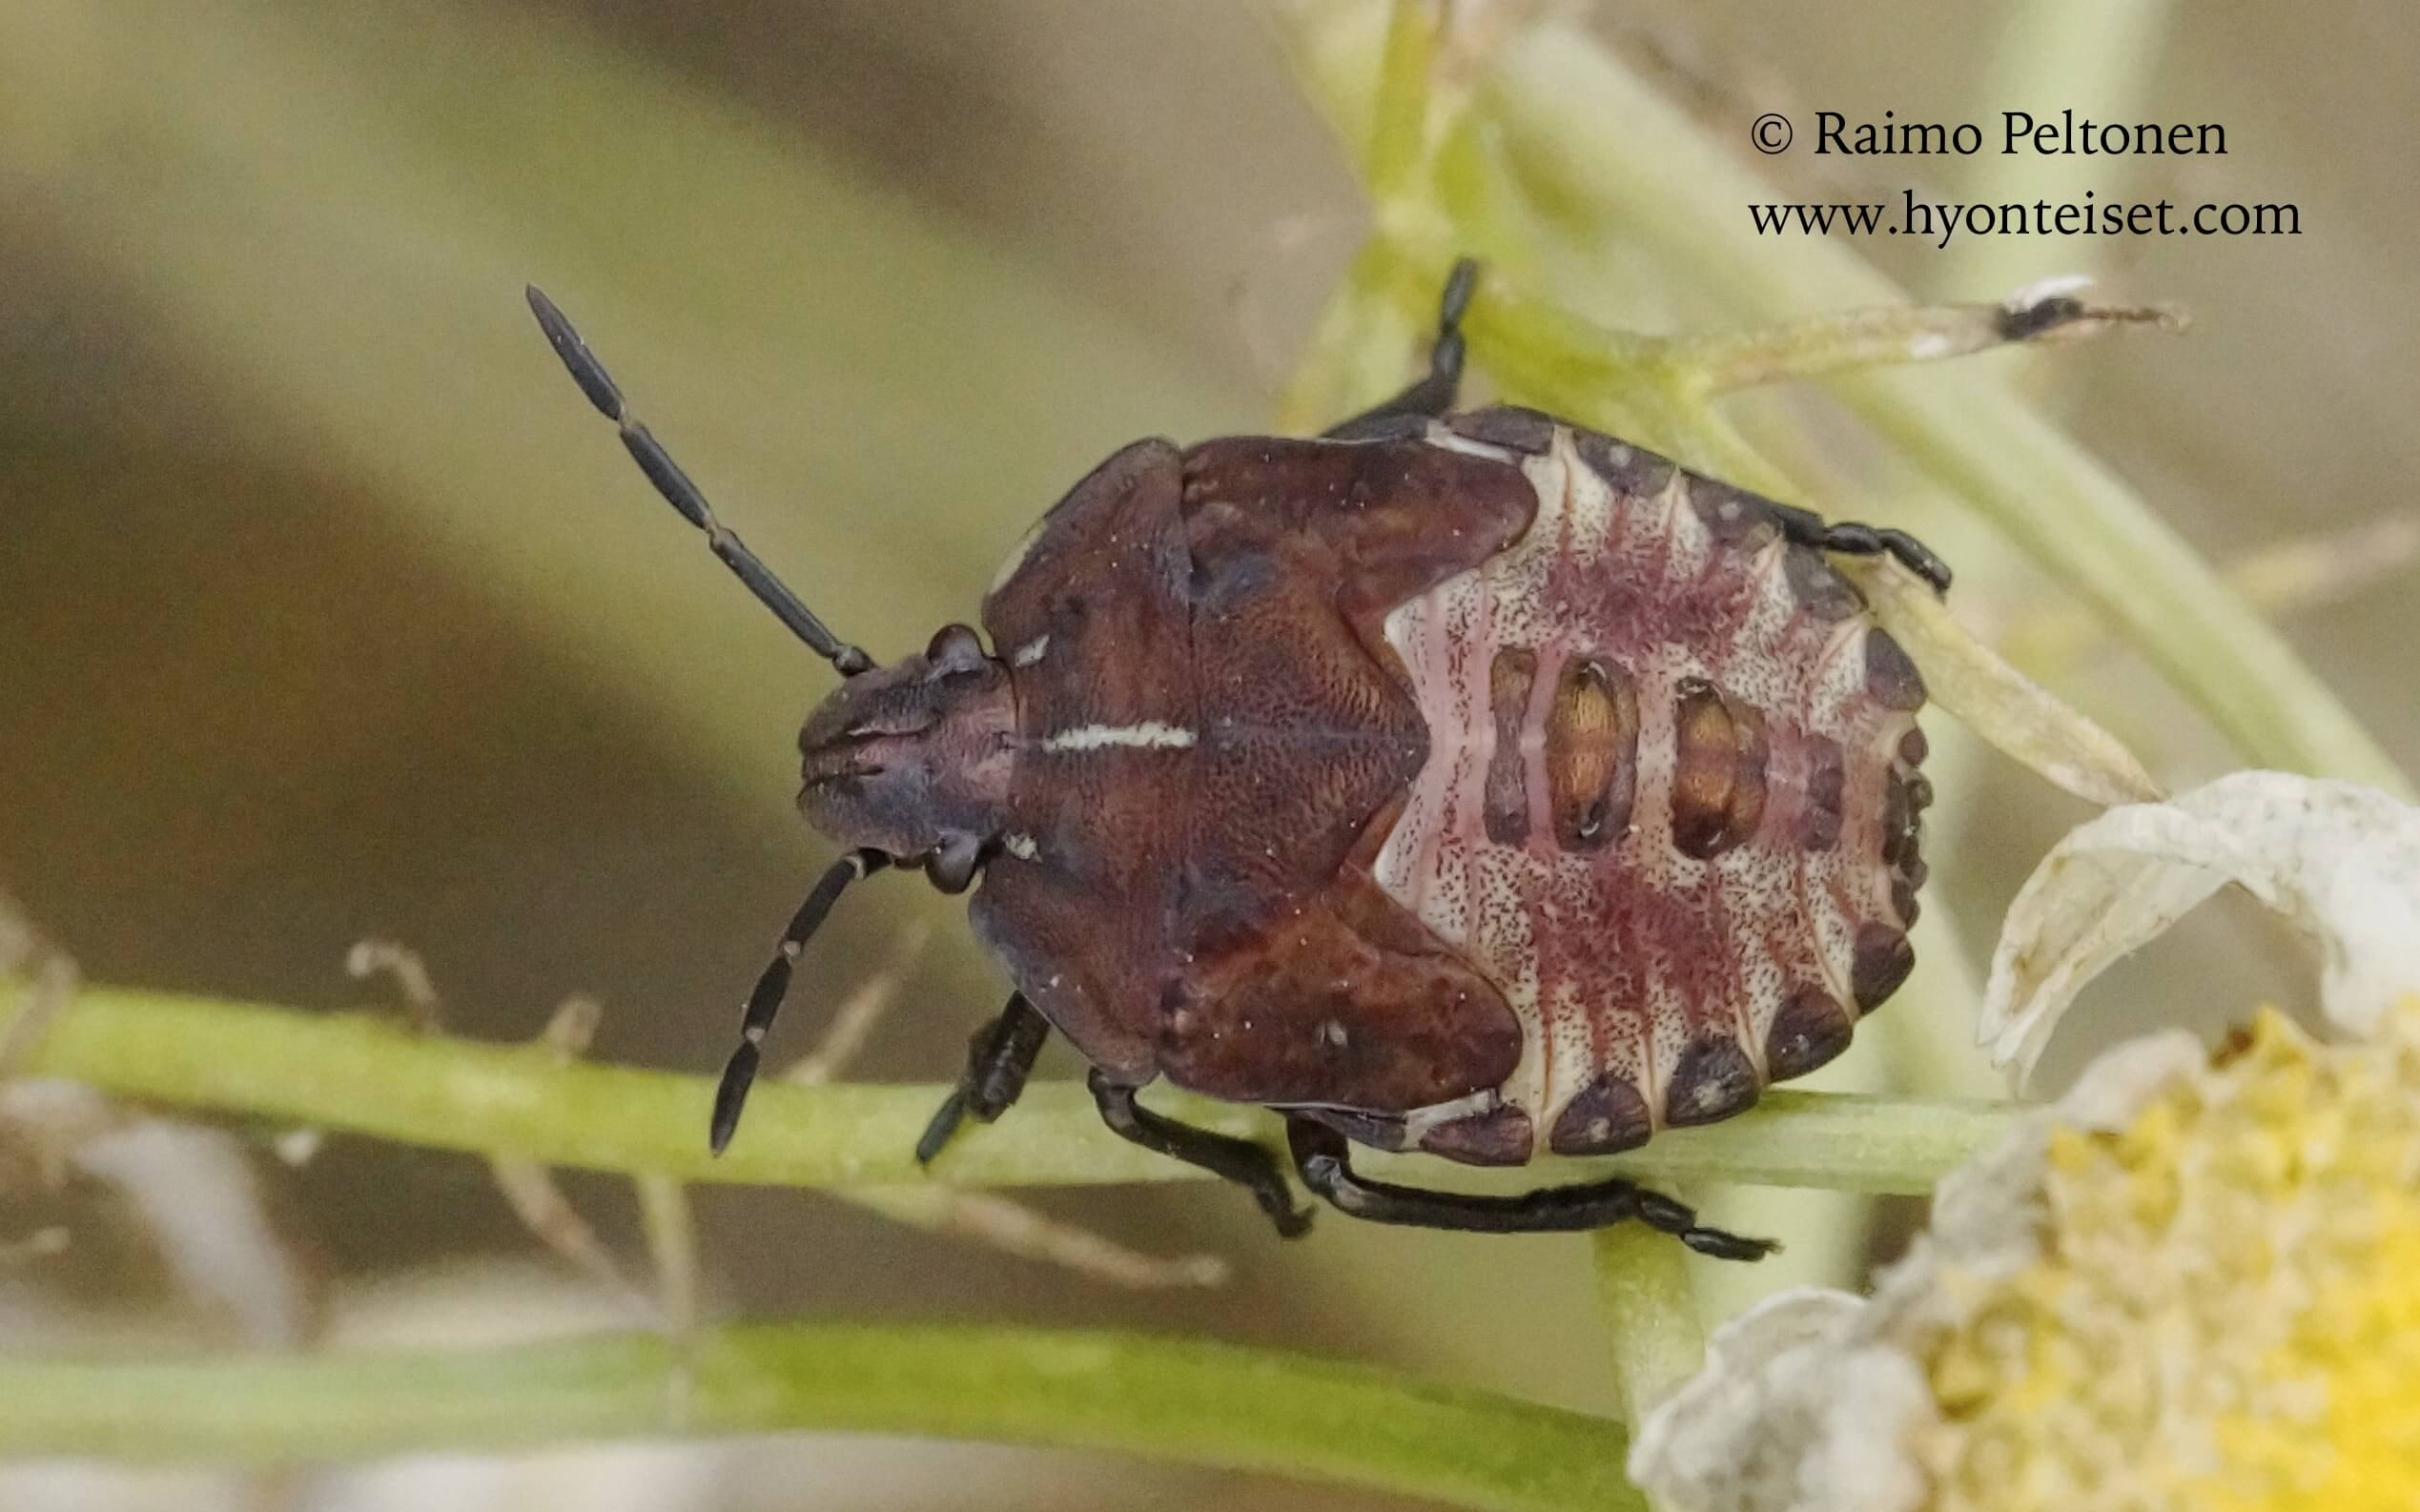 Carpocoris purpureipennis-kuparilude, nymfi (det. Veikko Rinne)